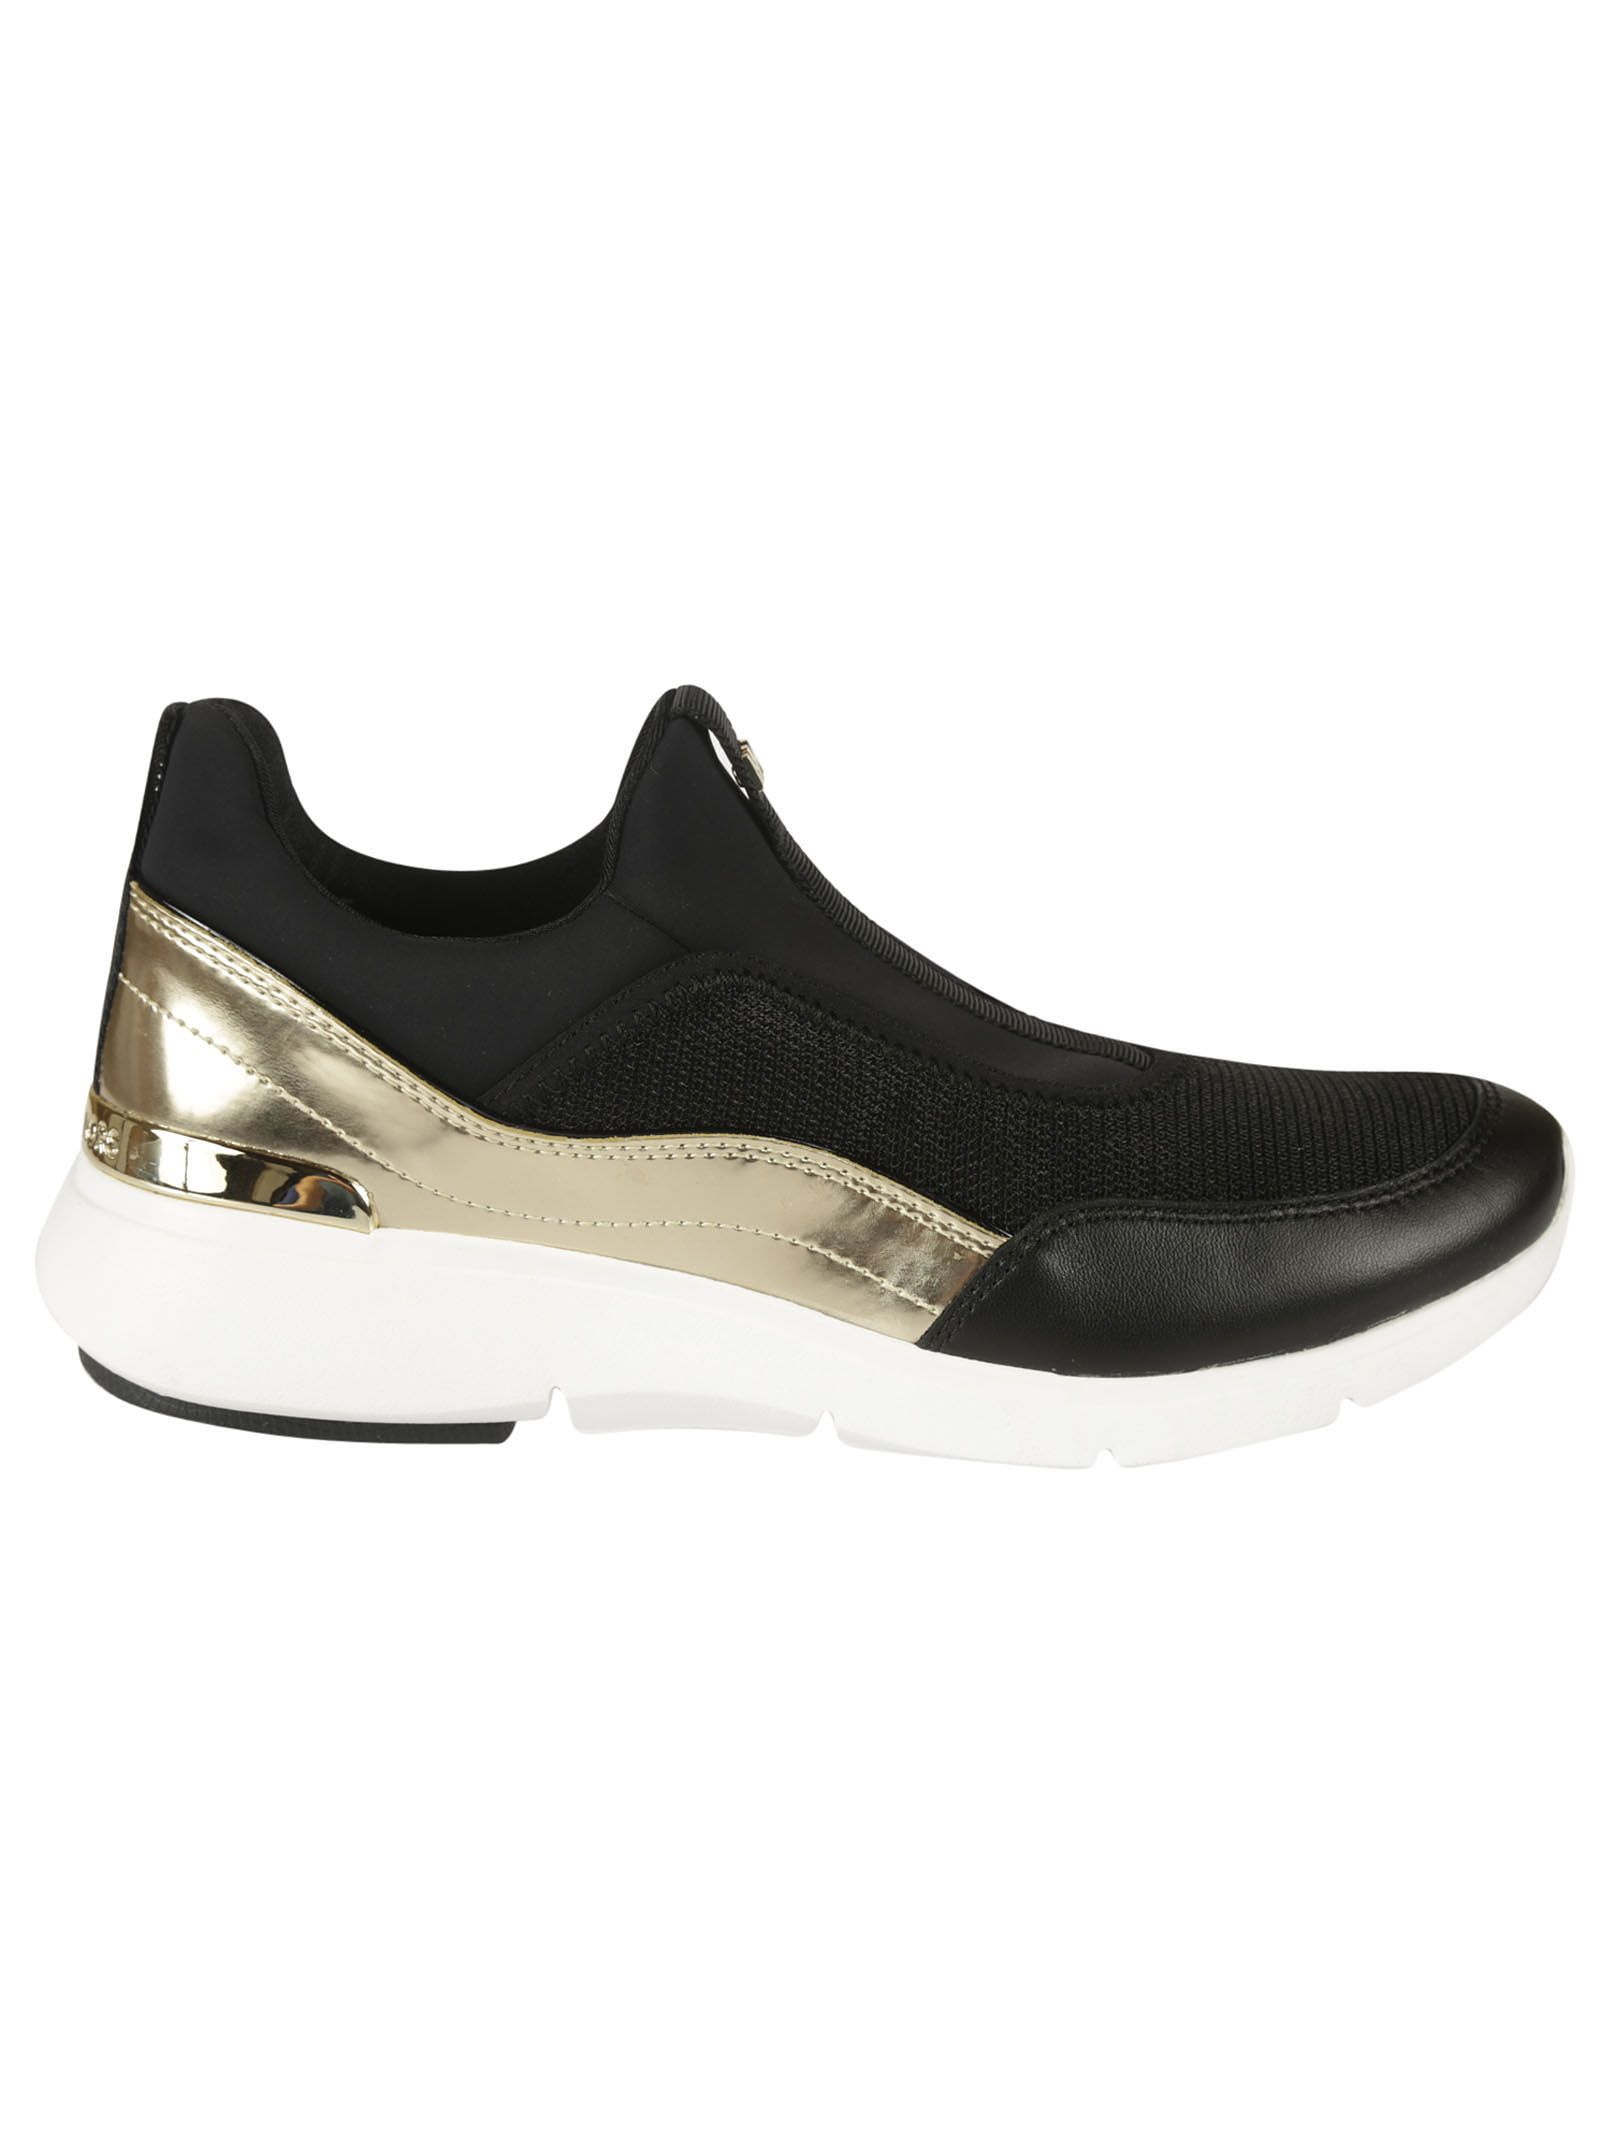 Michael Kors Ace Sneaker